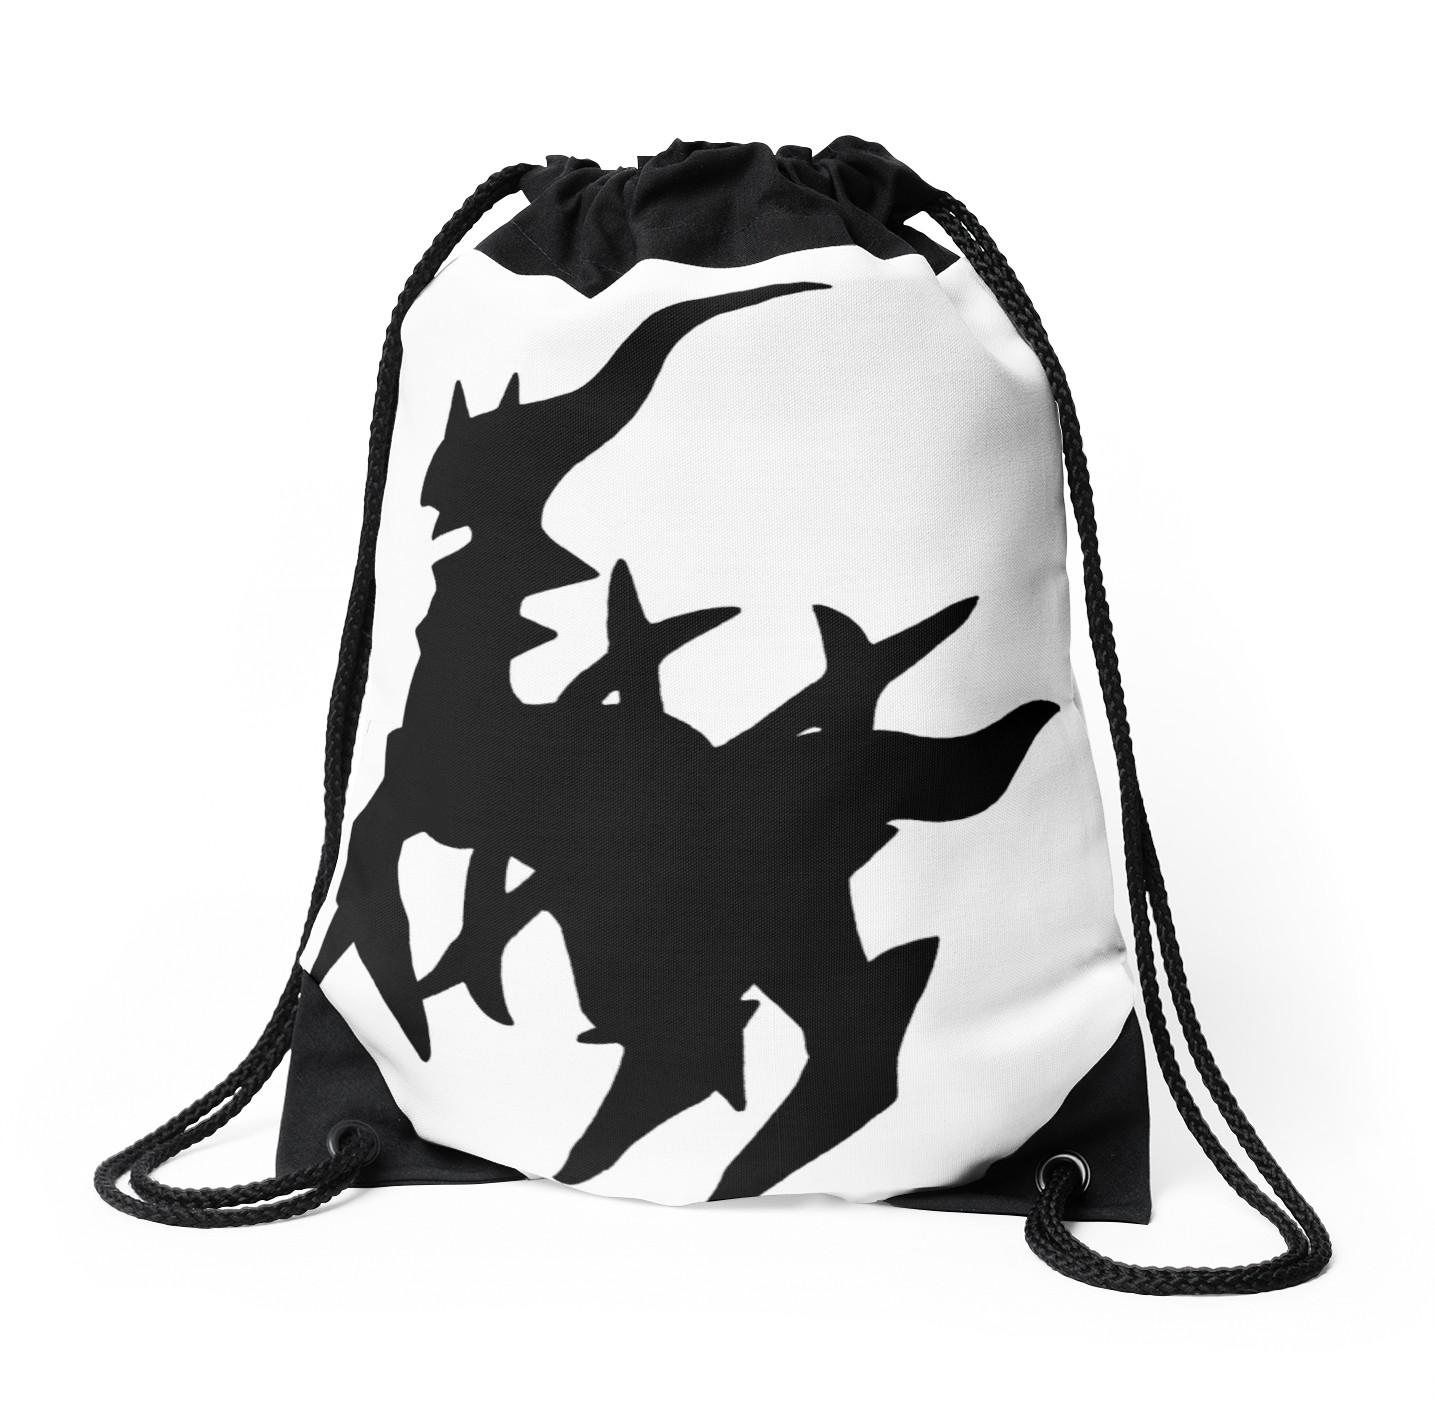 1435x1404 Arceus Silhouette Drawstring Bags By Frankie T Redbubble